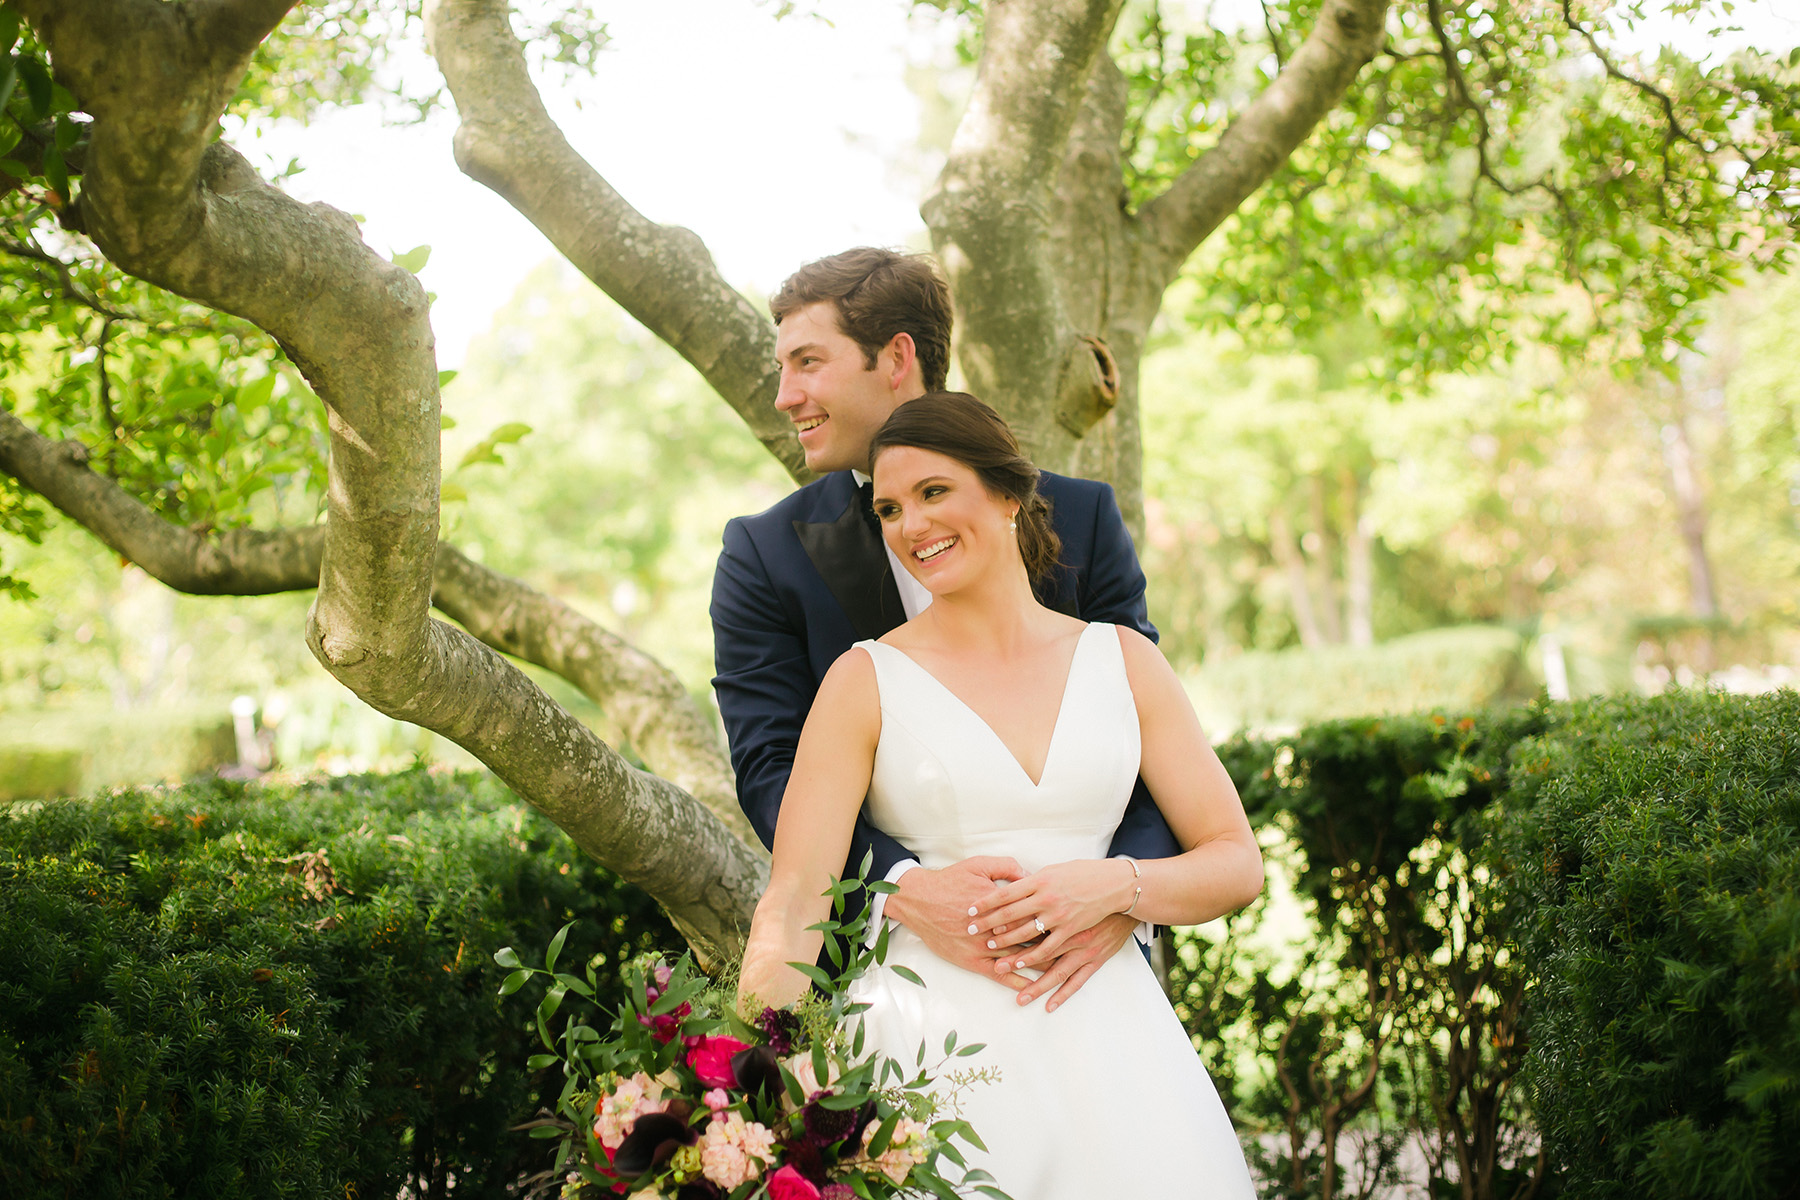 CAROLINE & CONNOR WEDDING